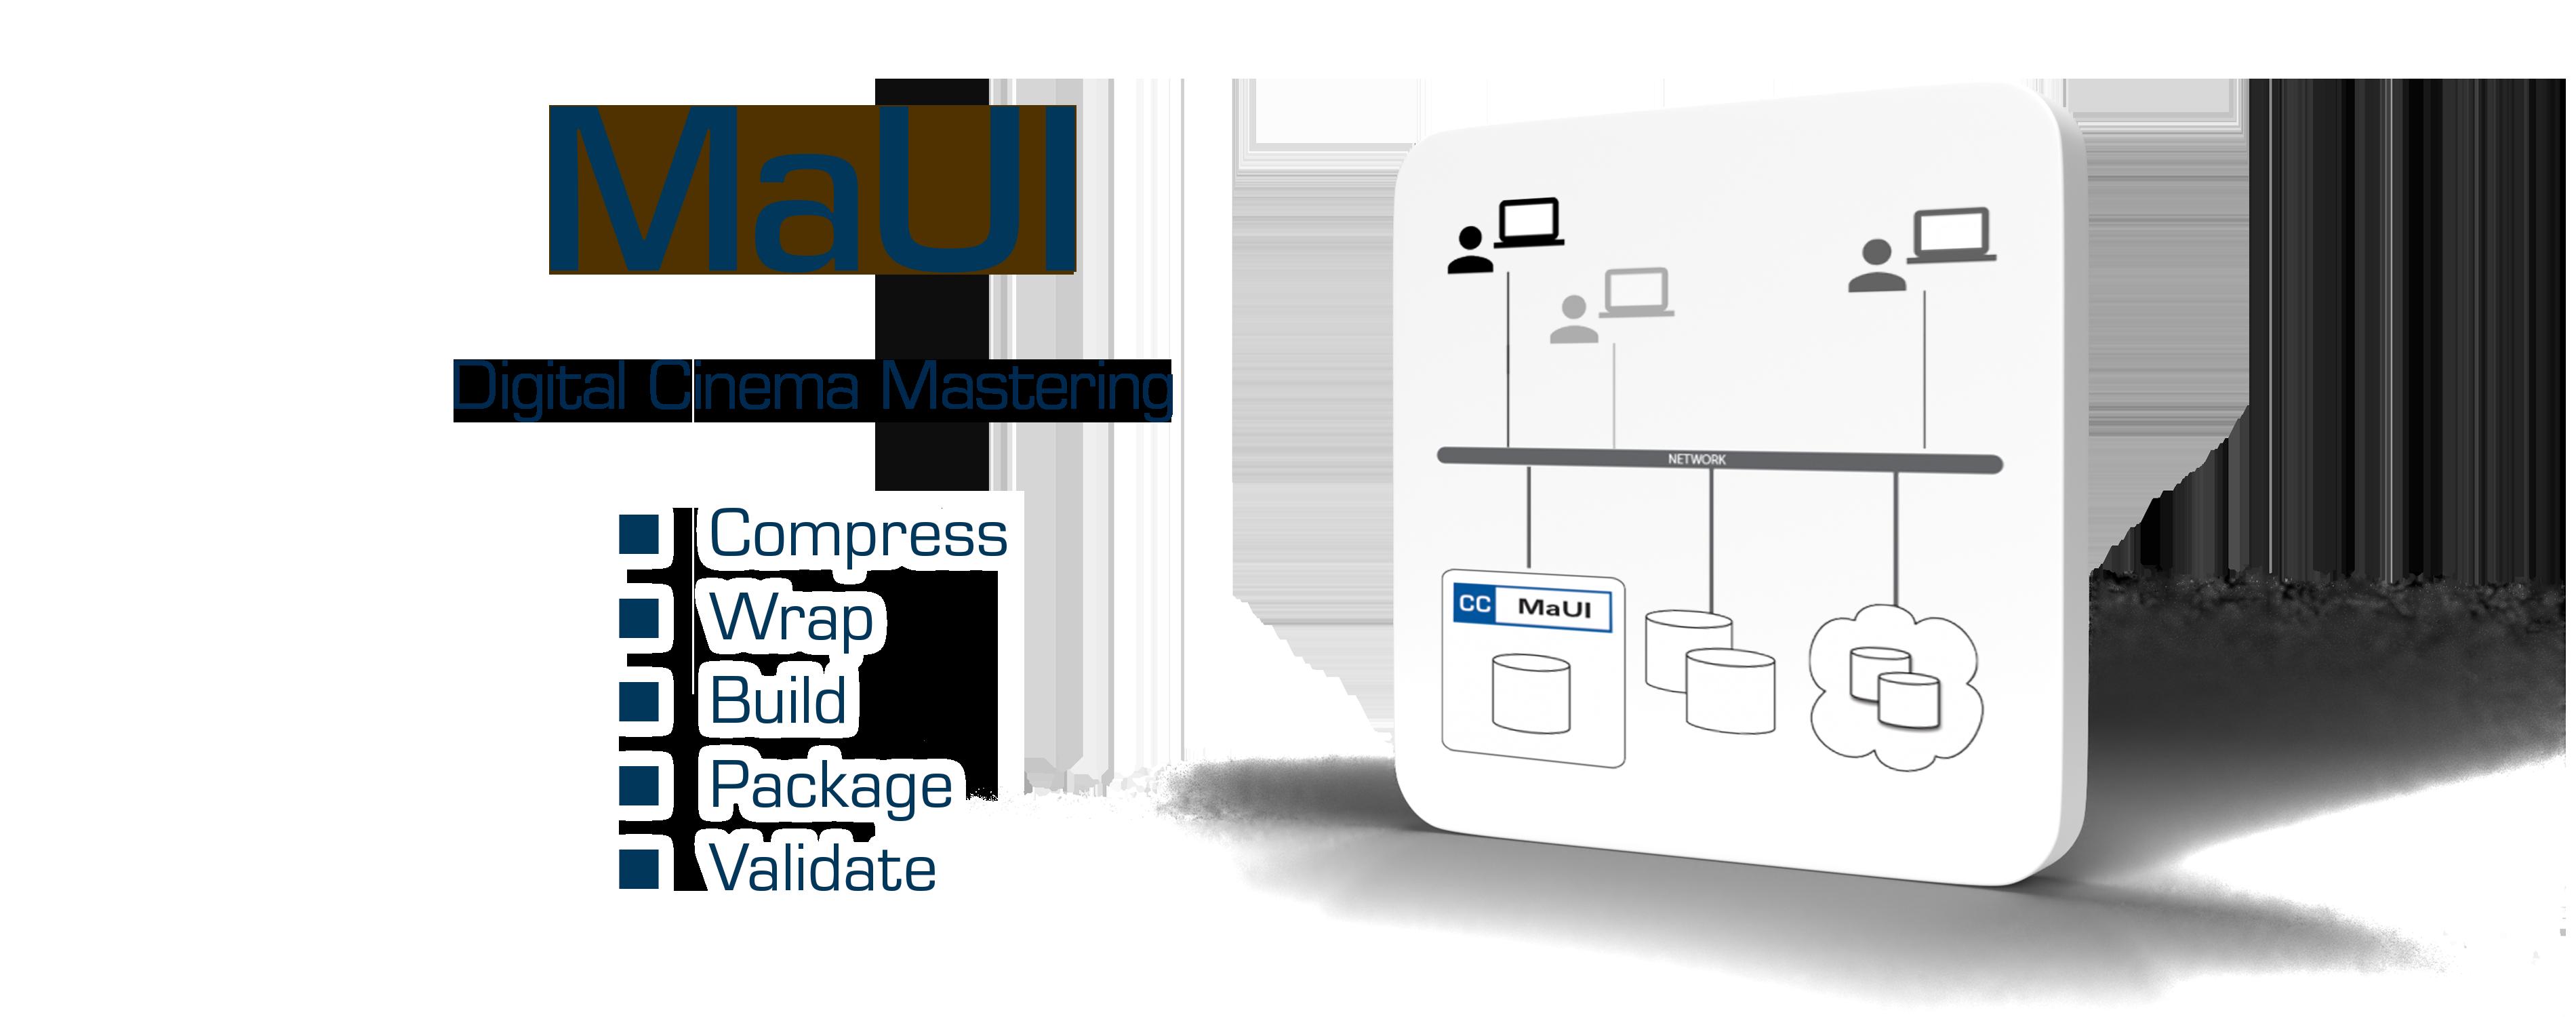 Maui - Digital Cinema Mastering - Compress - Wrap - Build - Package - Validate